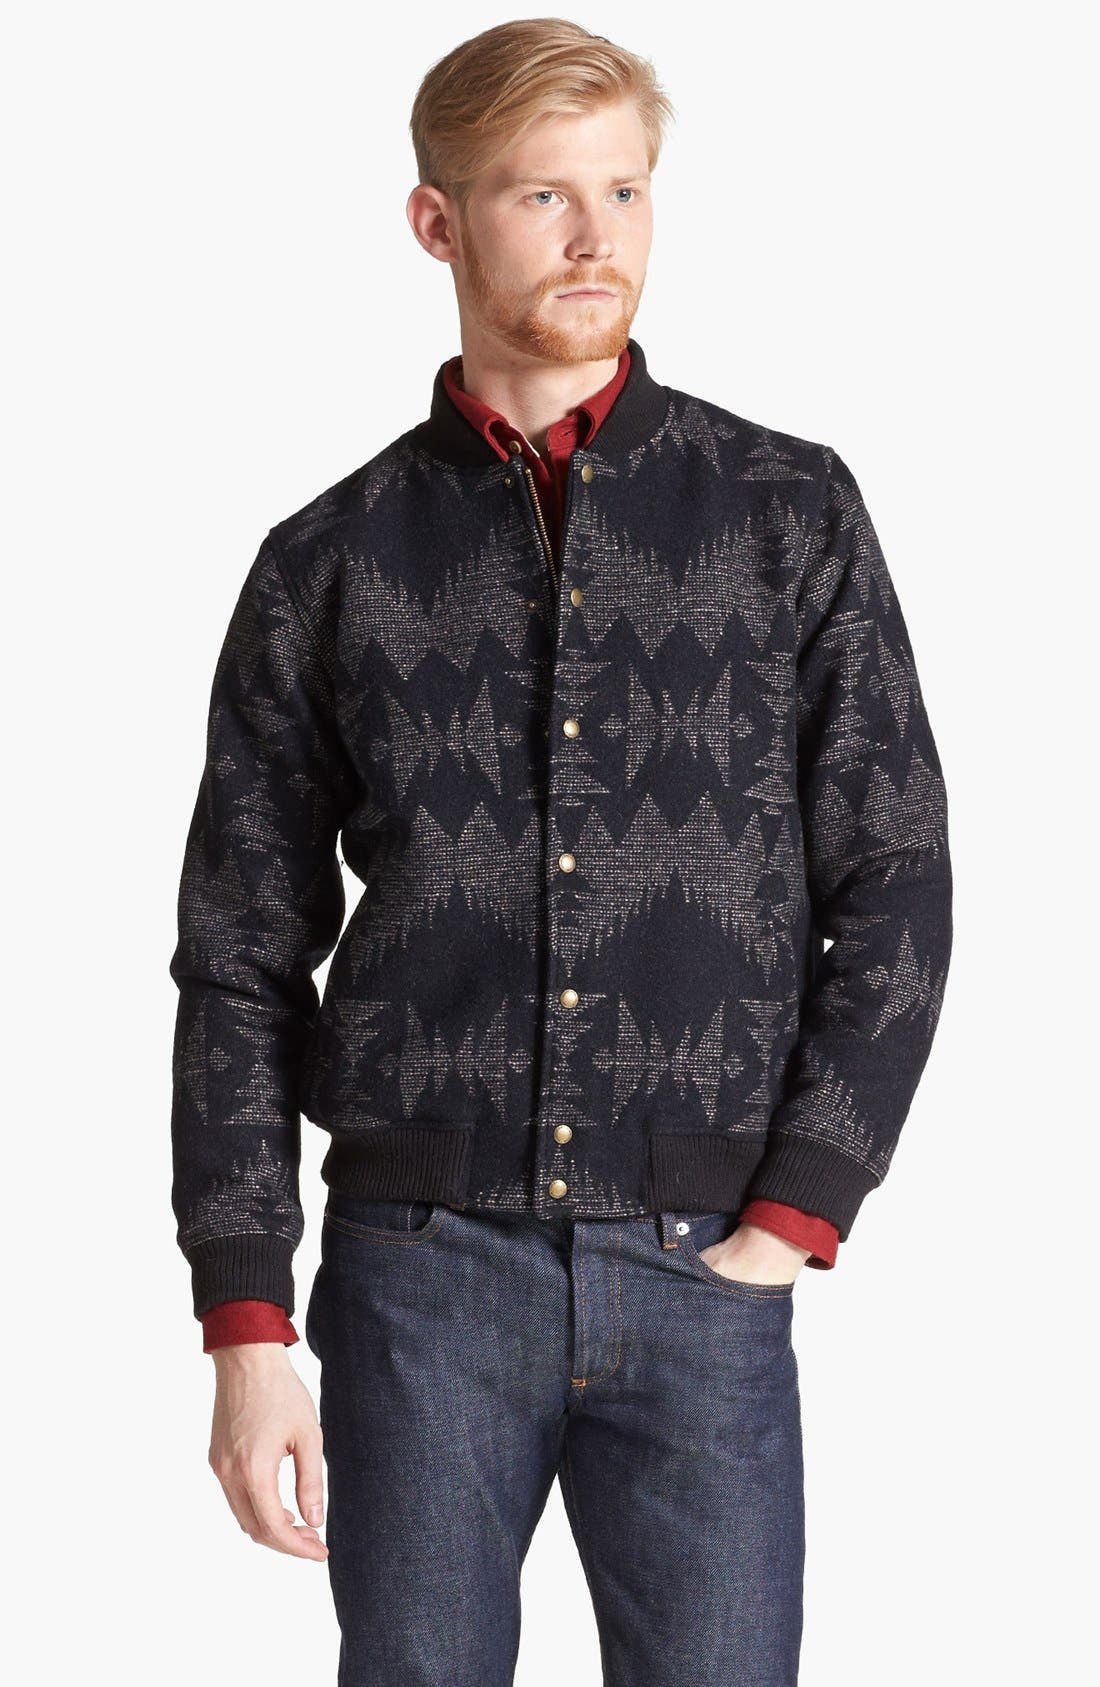 Alternate Image 1 Selected - Pendleton Portland Collection 'Franklin' Wool & Cotton Varsity Jacket